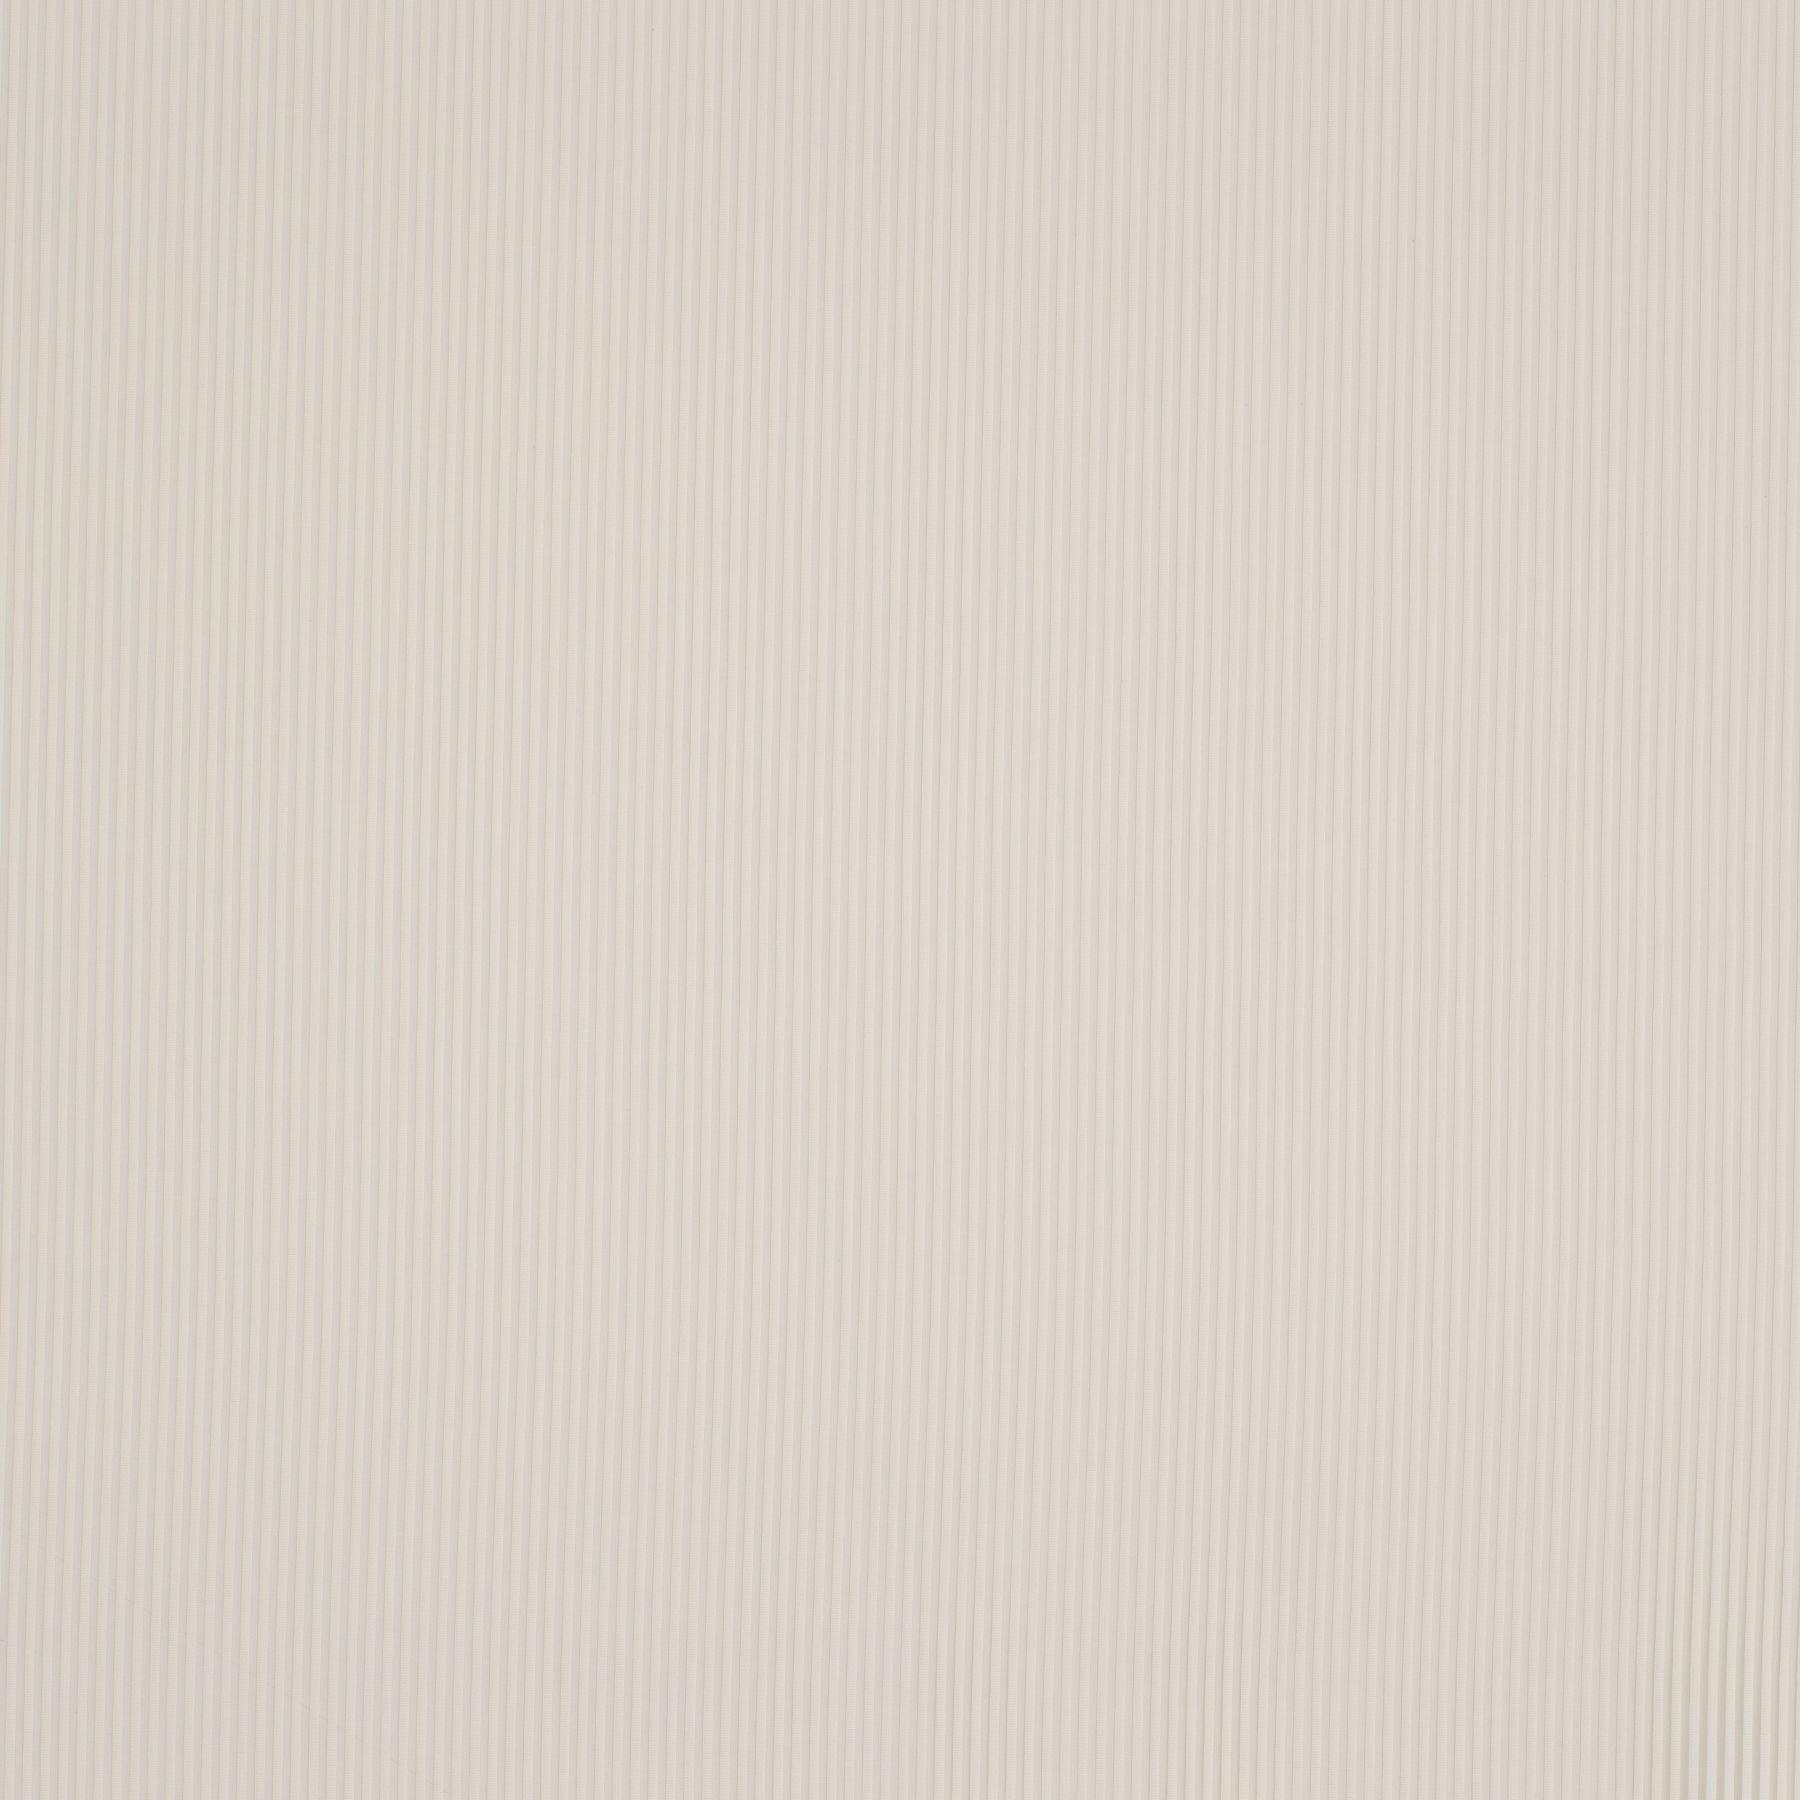 sheers actress 9 7693 070 jab anstoetz. Black Bedroom Furniture Sets. Home Design Ideas